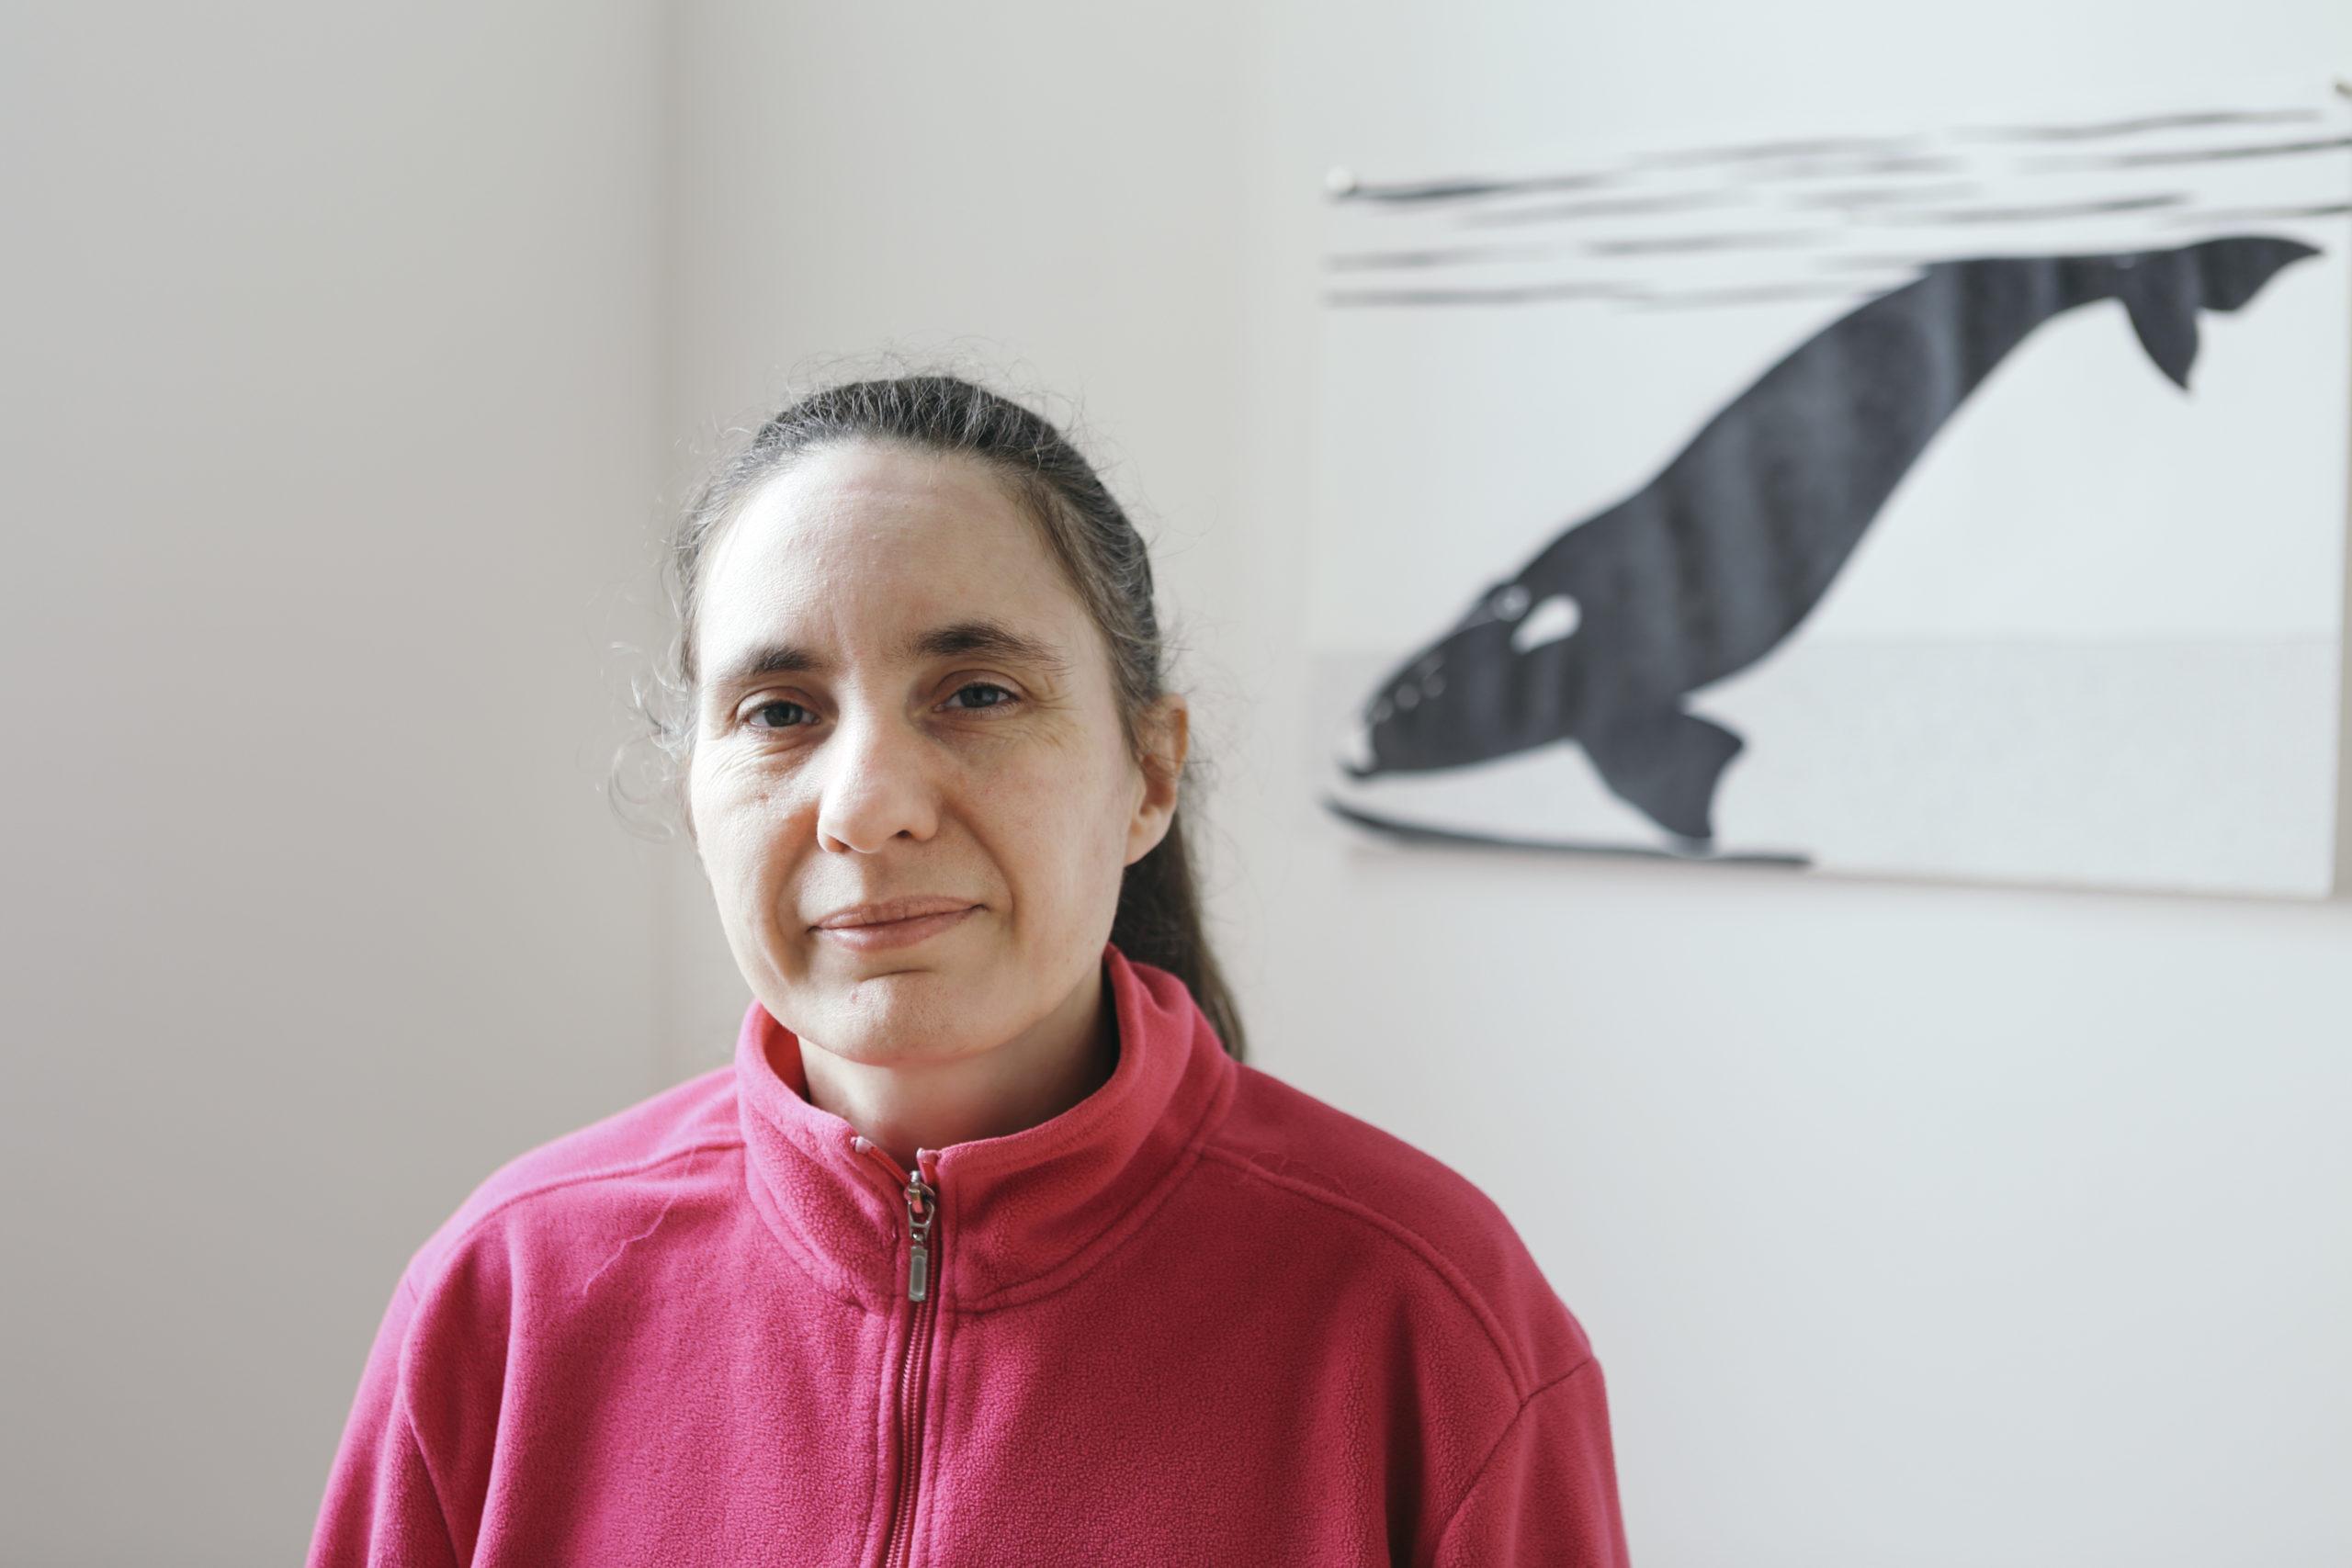 Paula Whiting